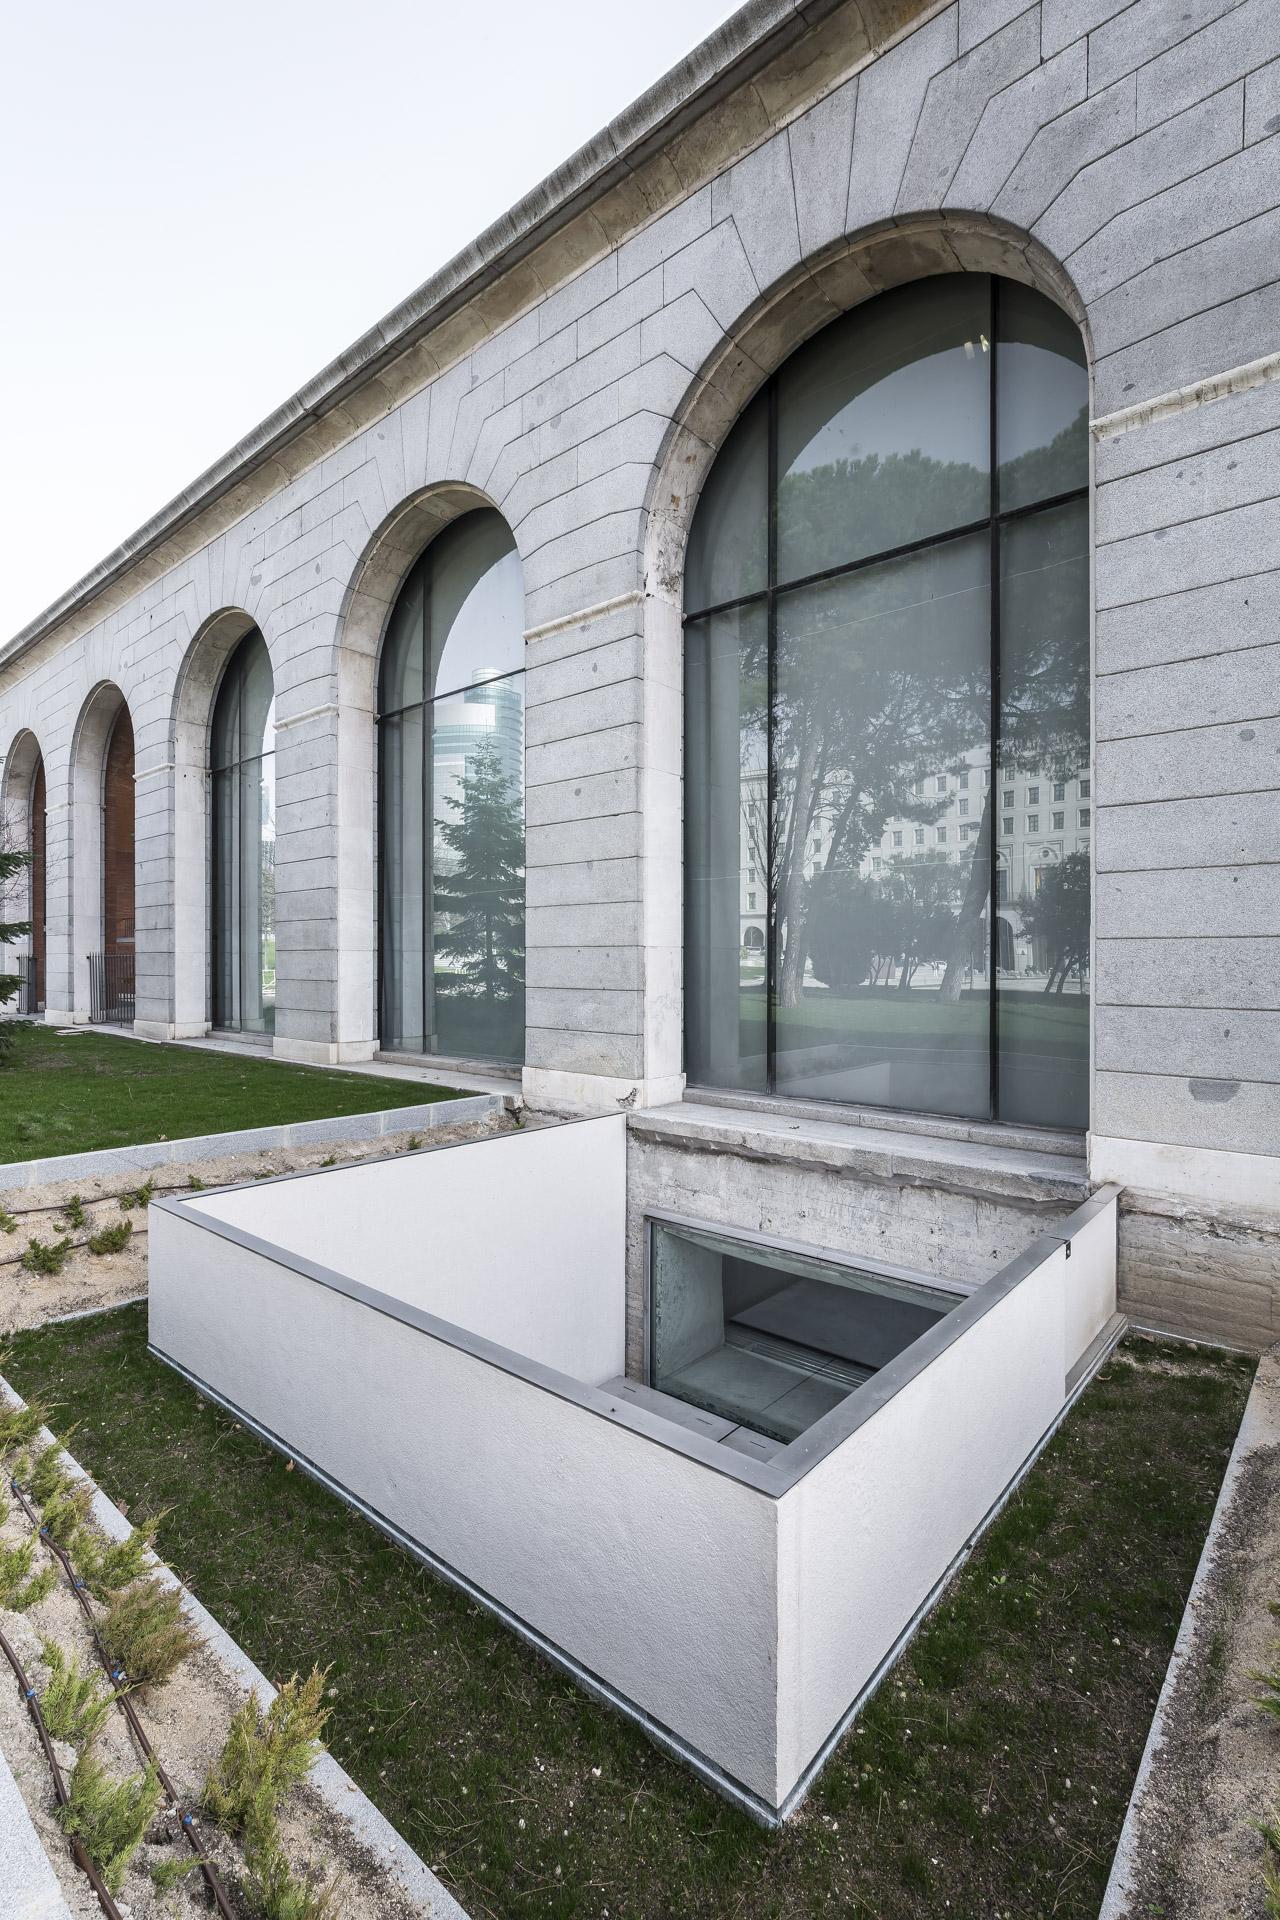 fotografia-arquitectura-madrid-nuevos-ministerios-elorza-german-cabo-04